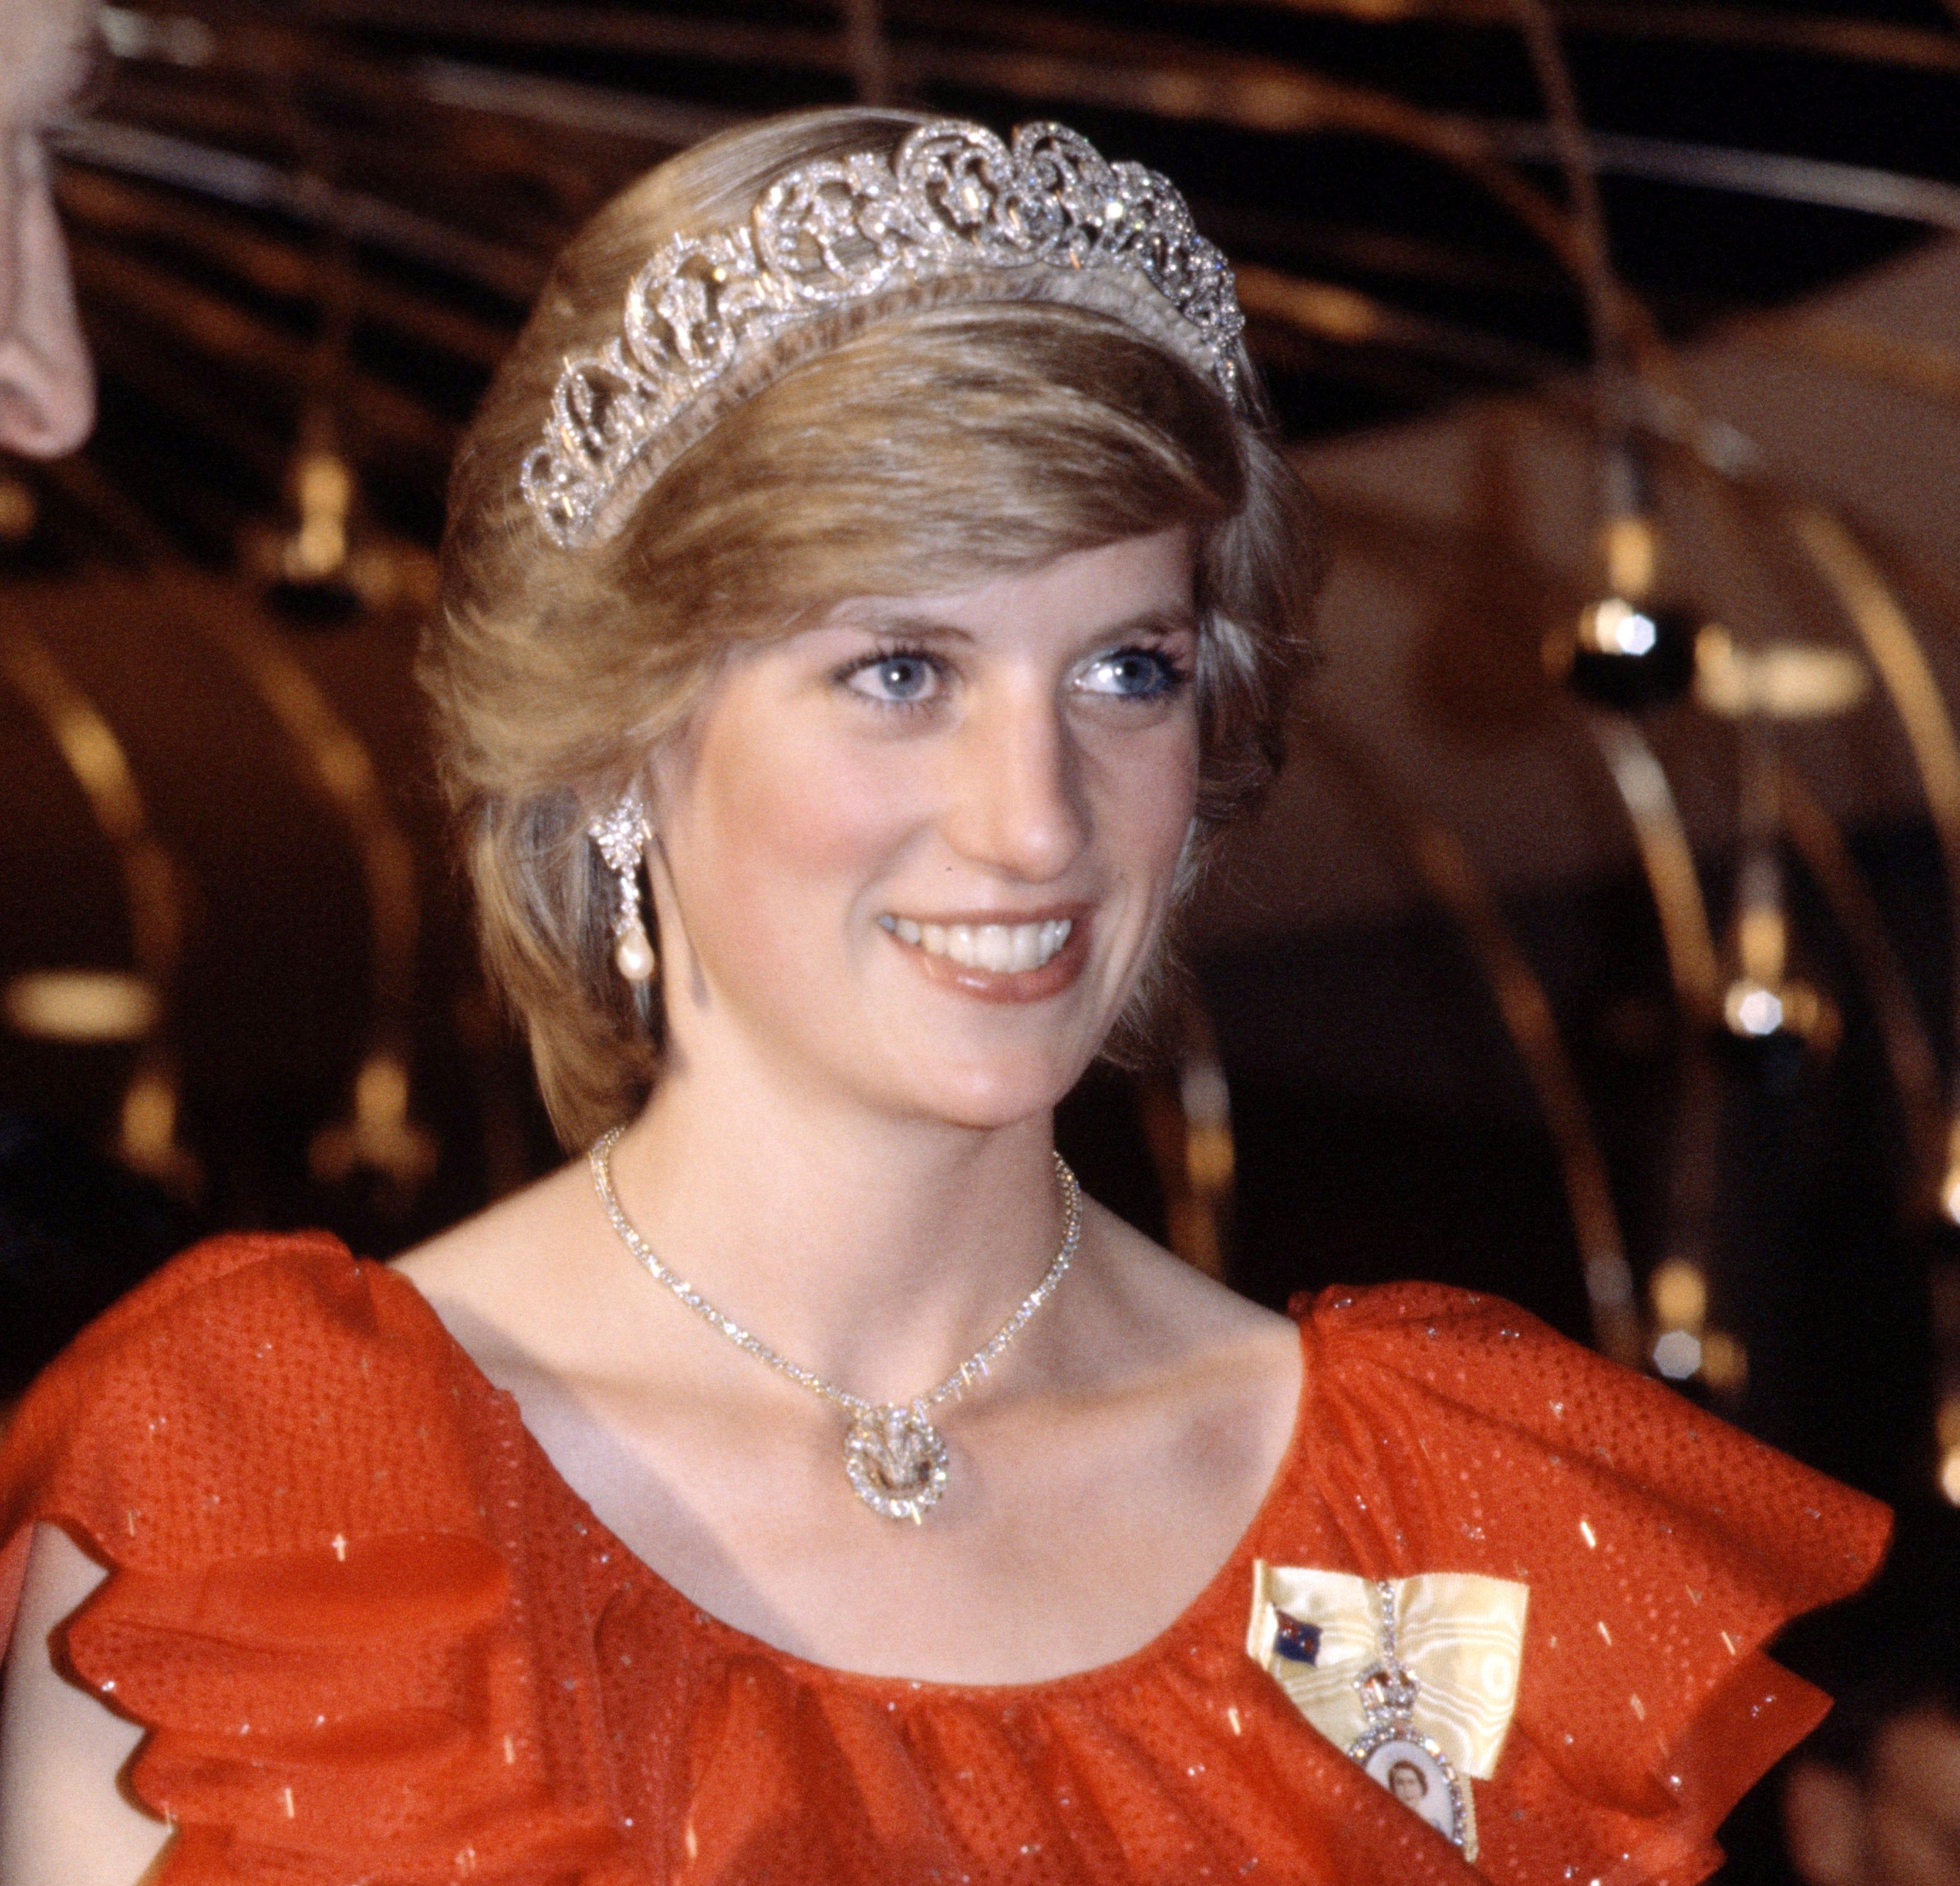 Feud Season 2 Princess Diana Prince Charles Fx Show New